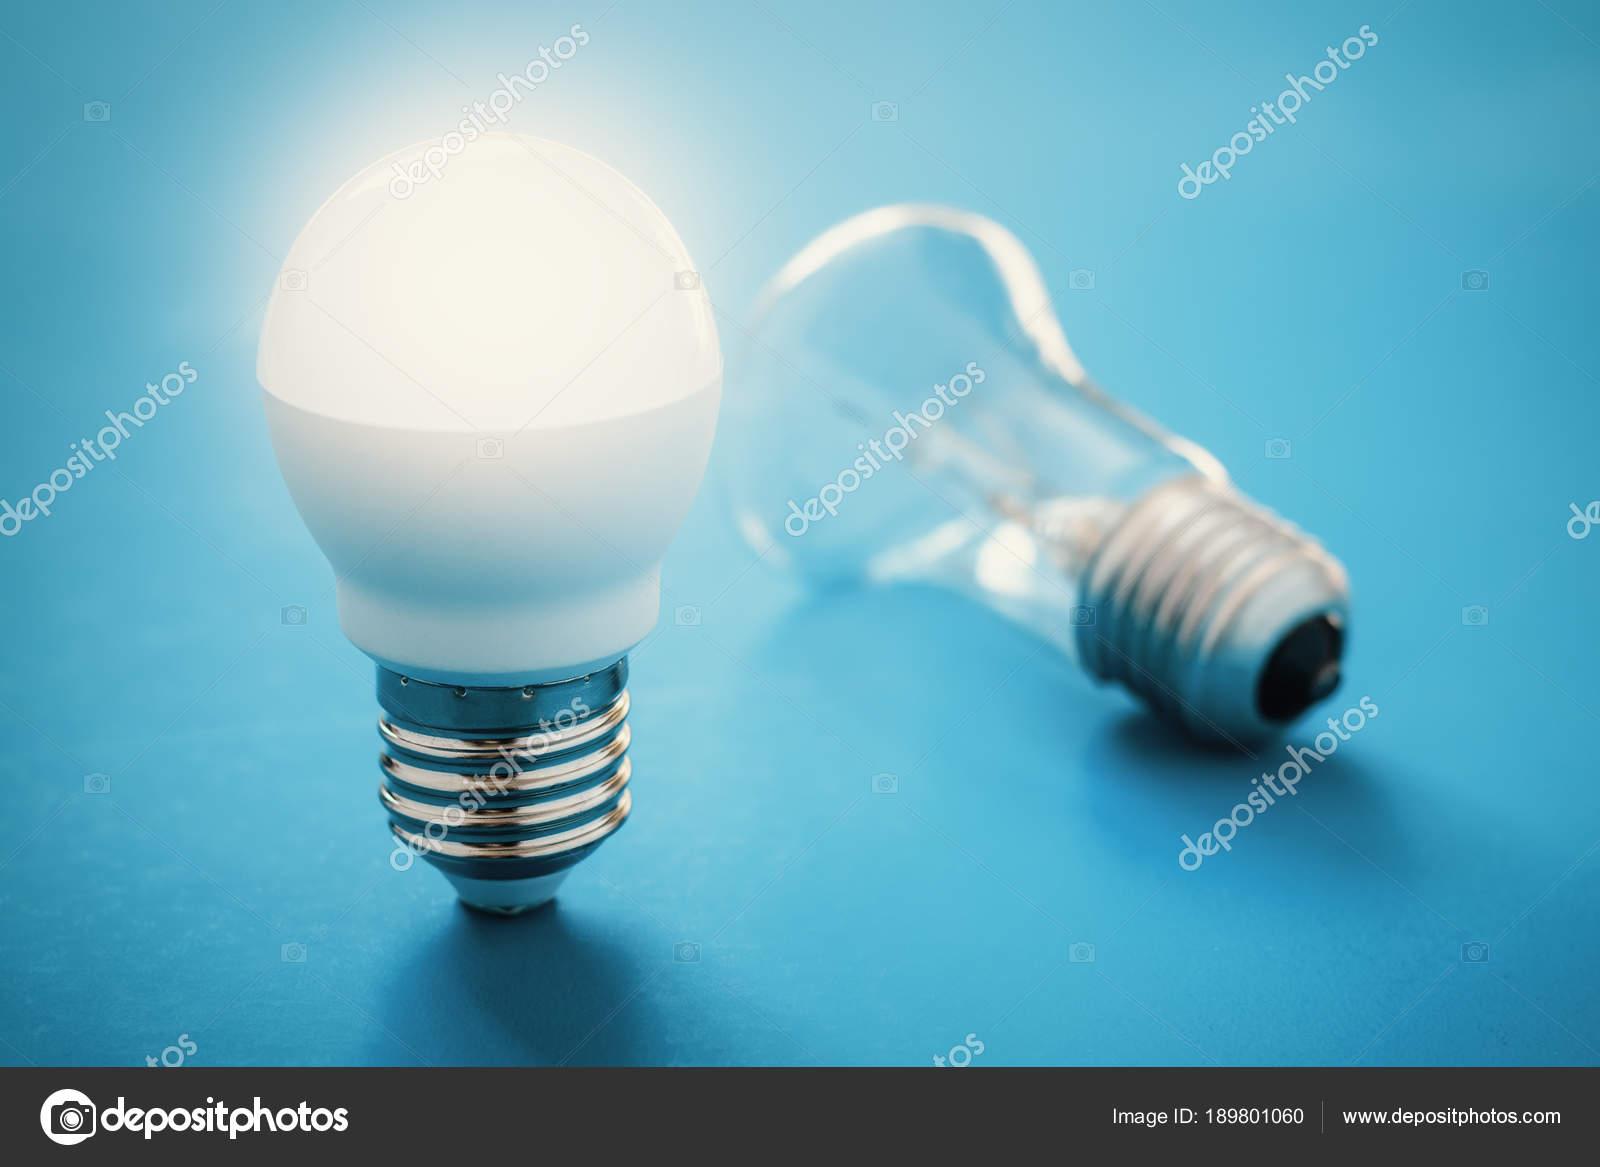 Lampada led illuminato vicino reclinabile lampada ad incandescenza